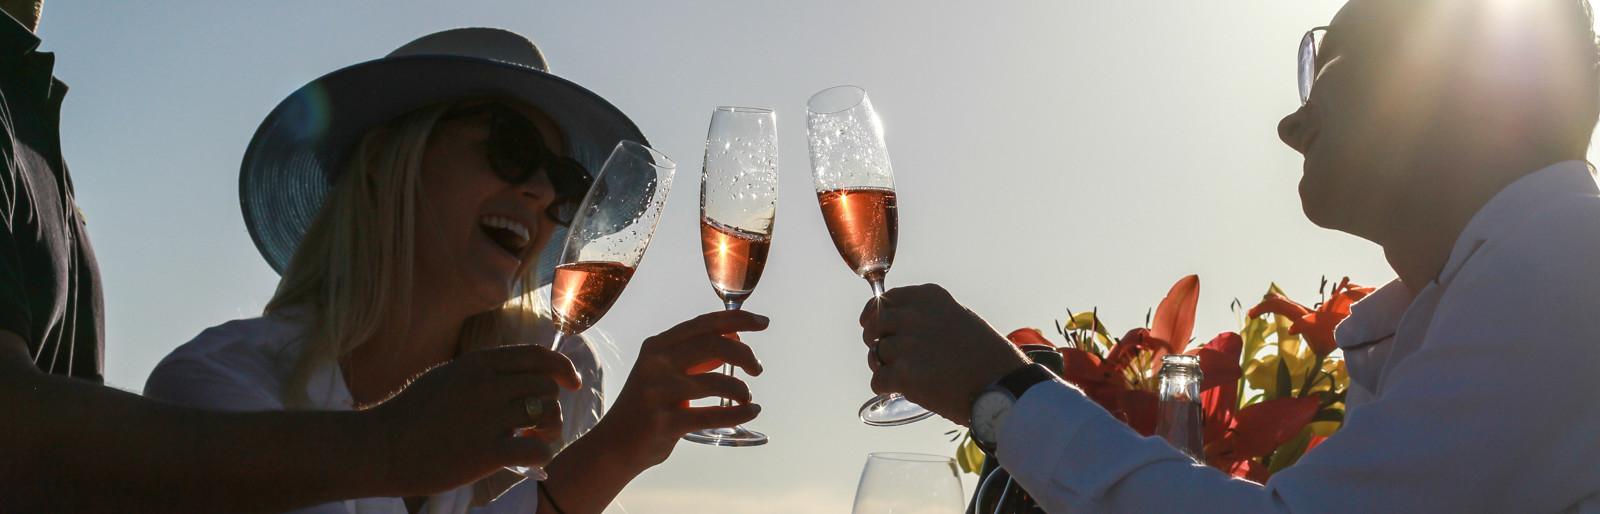 Win With Jan Harmsgat Wines